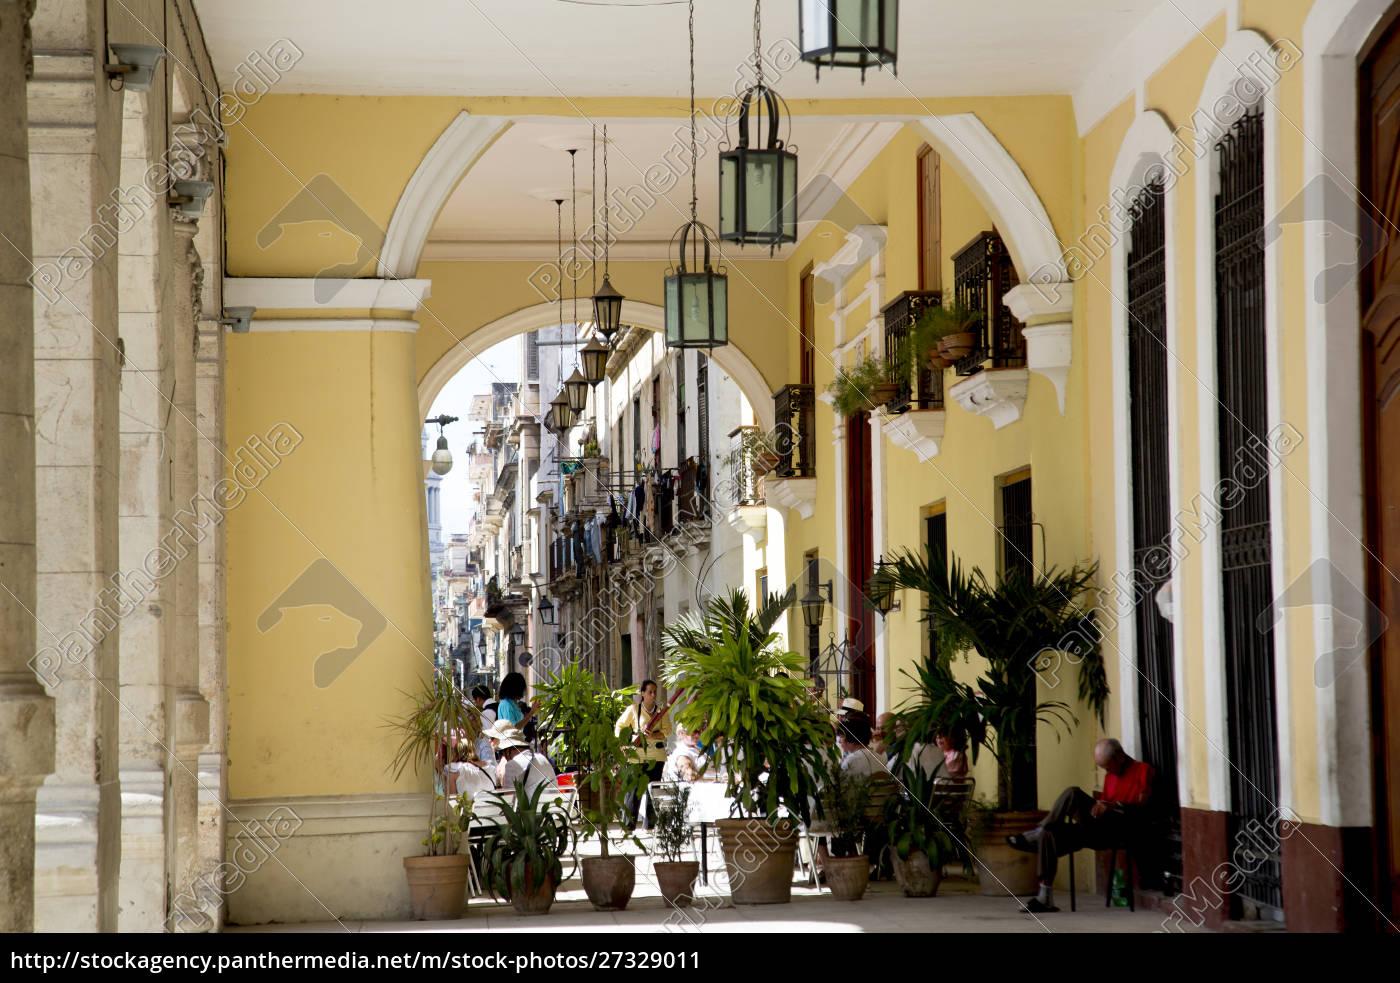 cuba, havana, colonial, arcade, old, havana, (la, habana, vieja) - 27329011